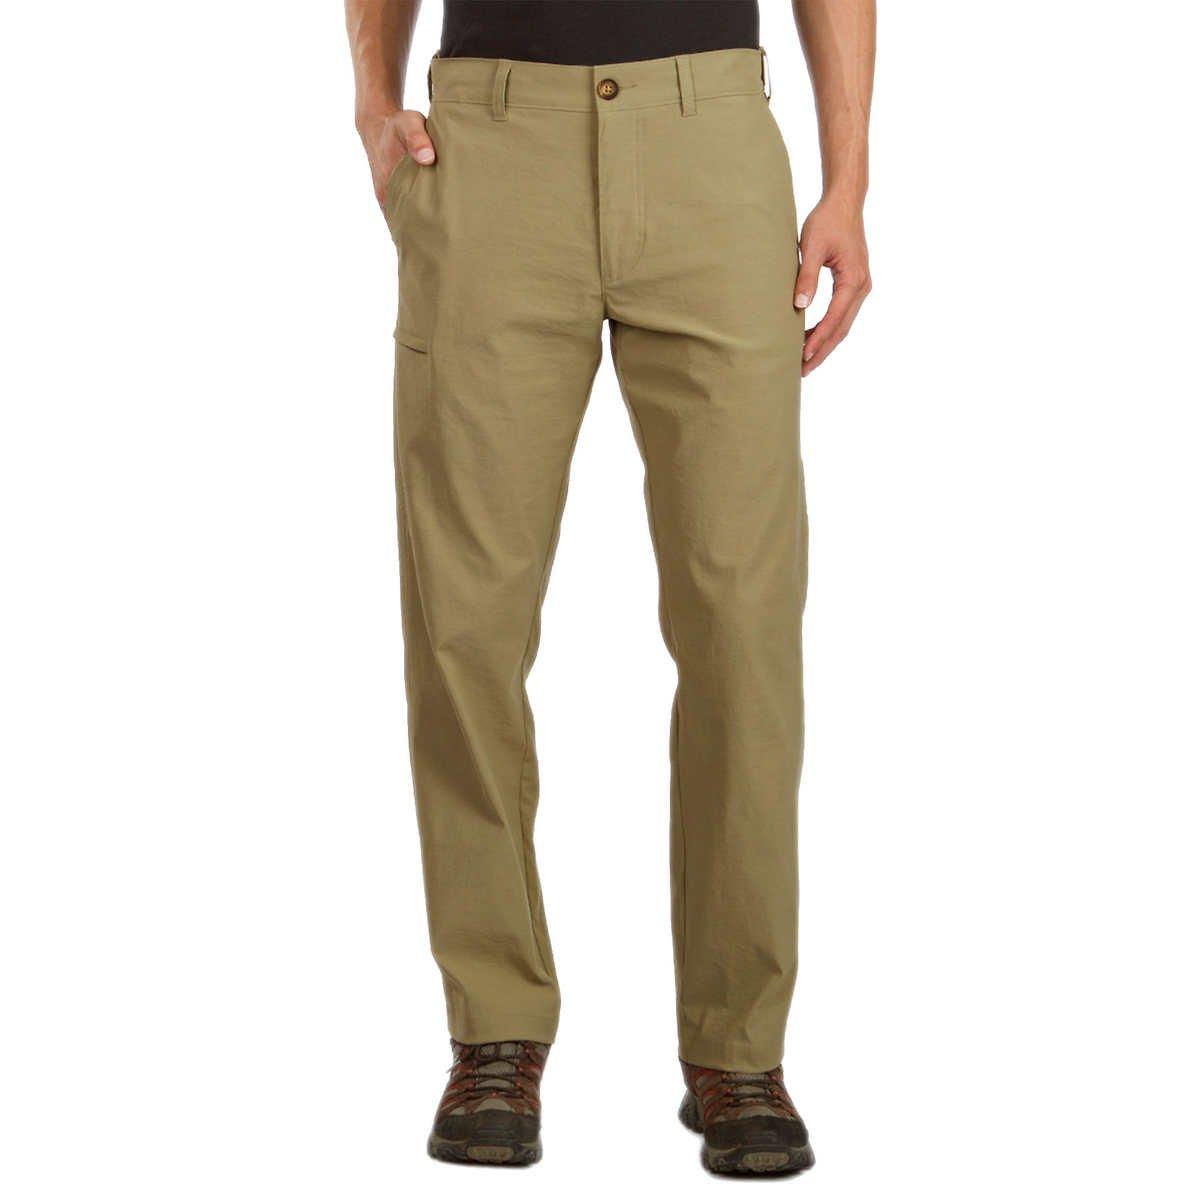 UNIONBAY UB Tech Classic Fit Expandable Comfort Waist Chino Pant for Men (36W x 34L, Desert)